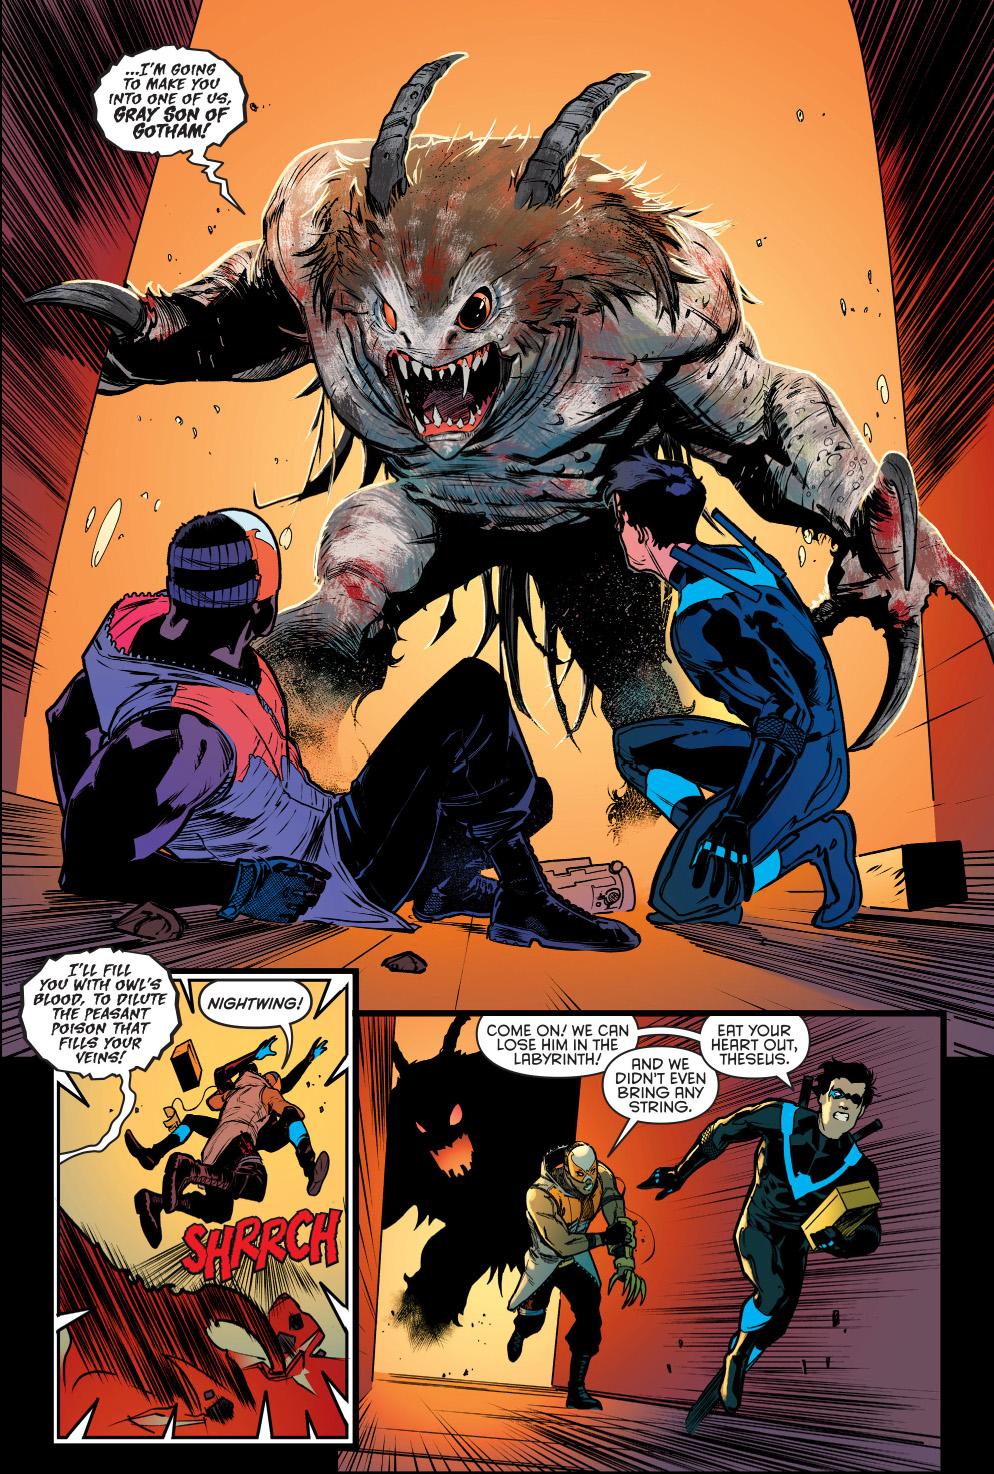 Moloch (Nightwing Vol 4 #4)